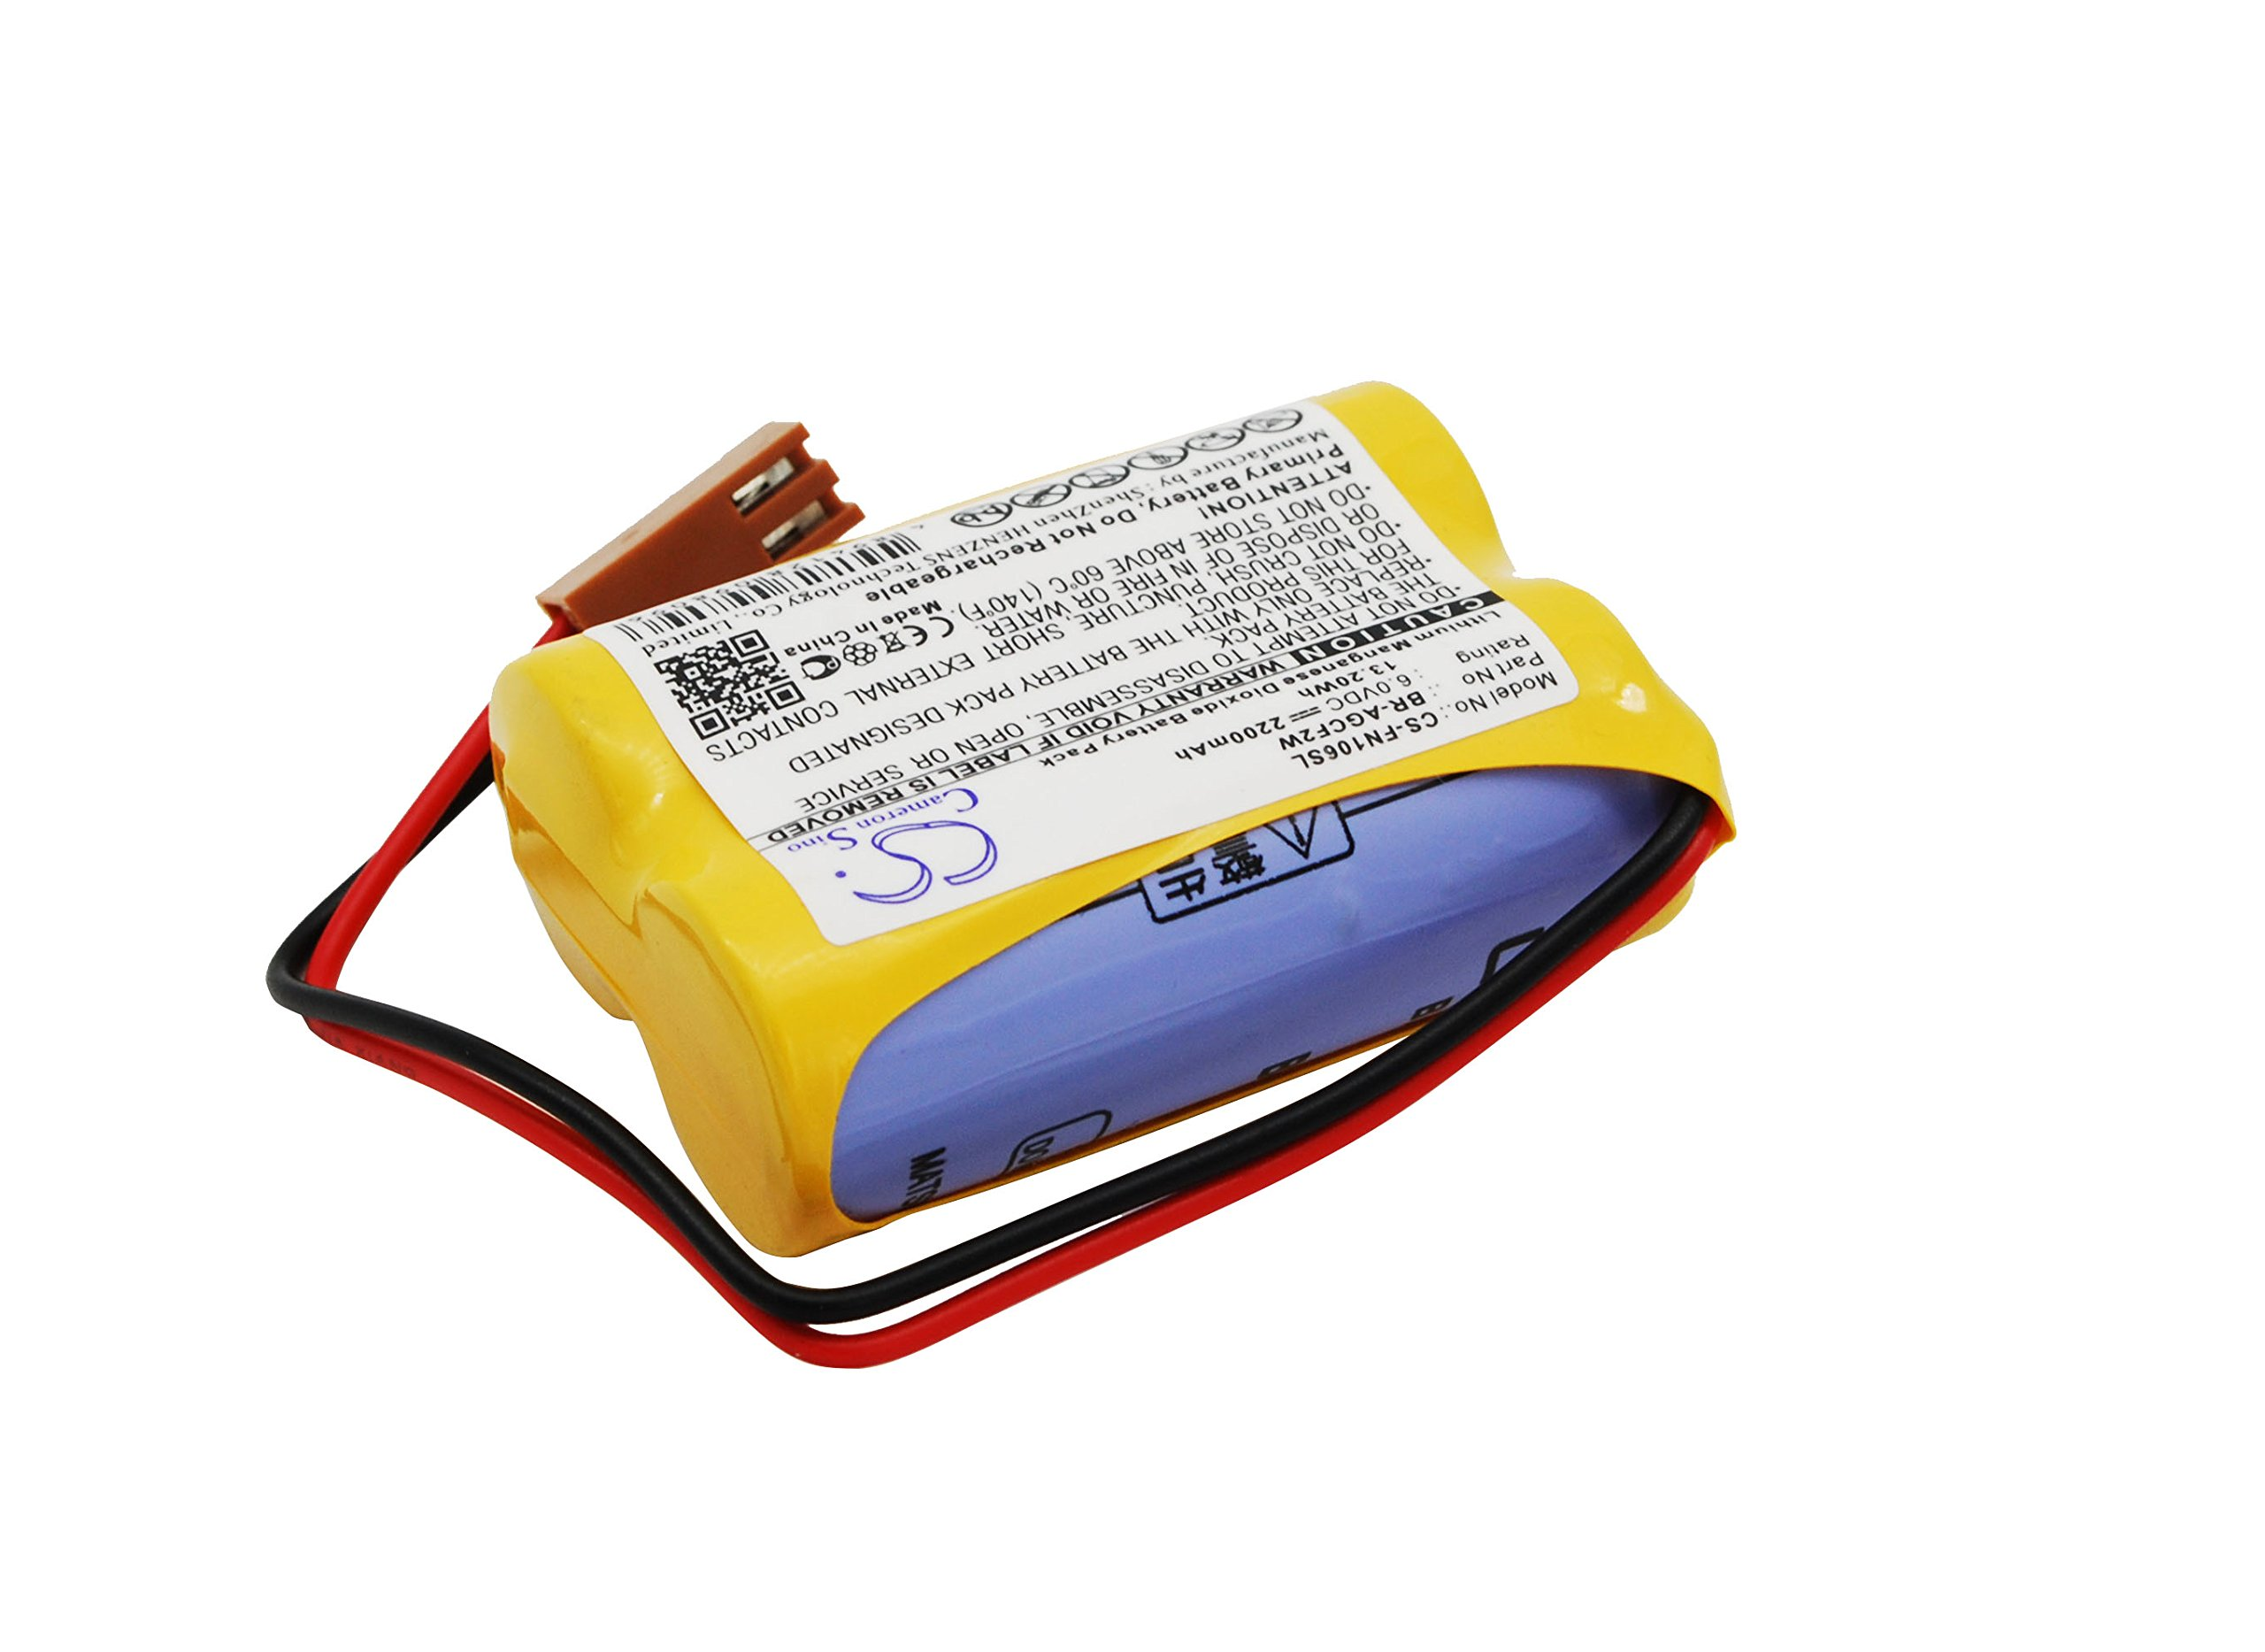 VINTRONS 2200mAh battery for GE Fanuc A06 programmable logic Fanuc A06 industrial computers Beta SVU Amplifier Beta iSV Amplifier